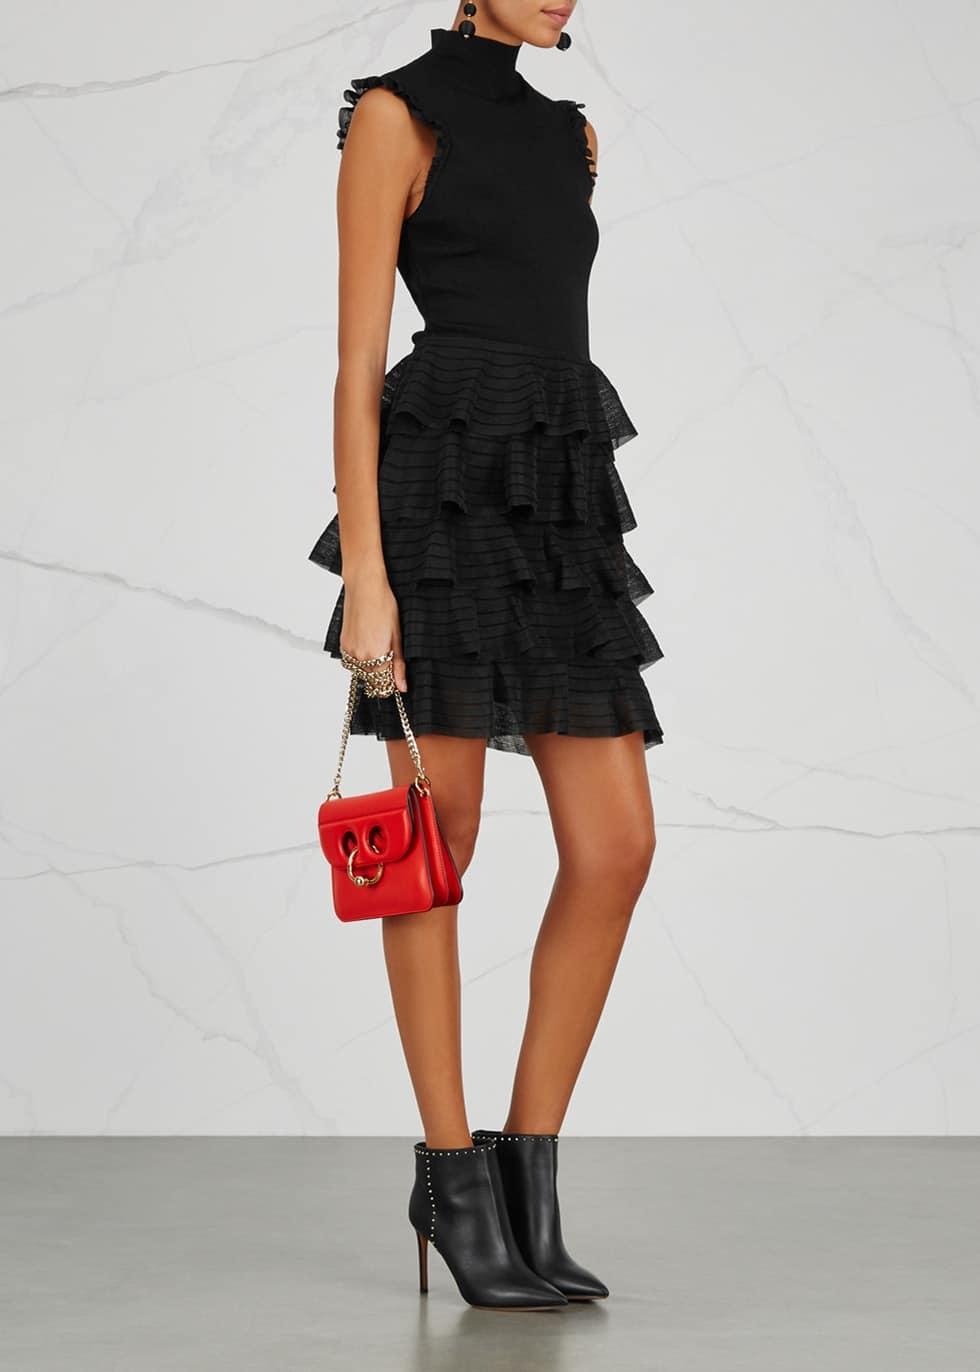 ALICE + OLIVIA Janice Ruffled Stretch Knit Black Dress